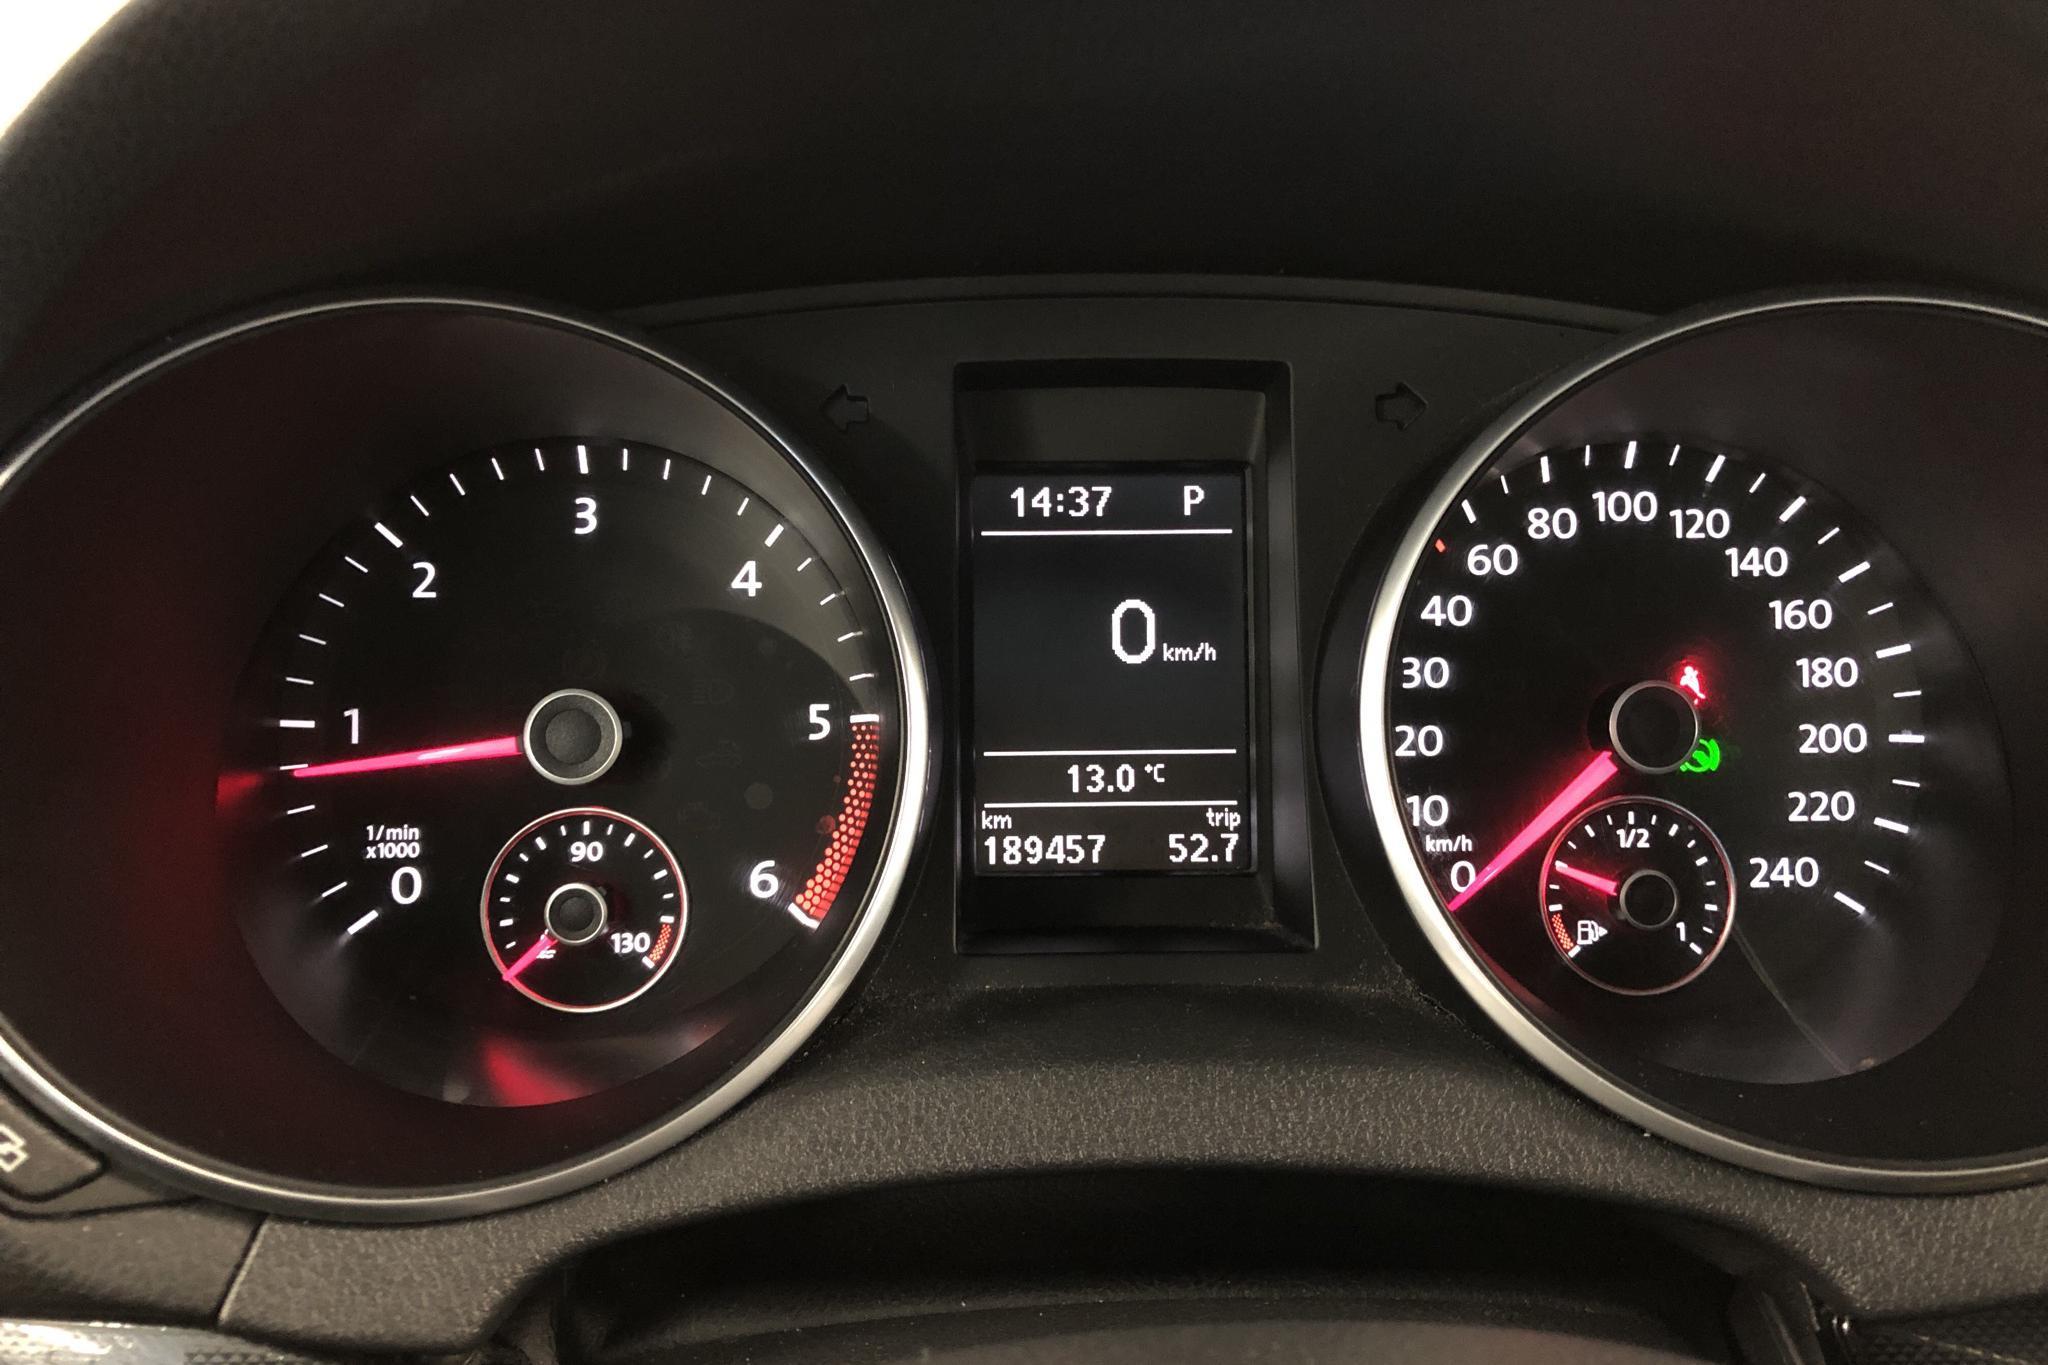 VW Golf VI 1.6 TDI BlueMotion Technology 5dr (105hk) - 0 km - Automatic - silver - 2011